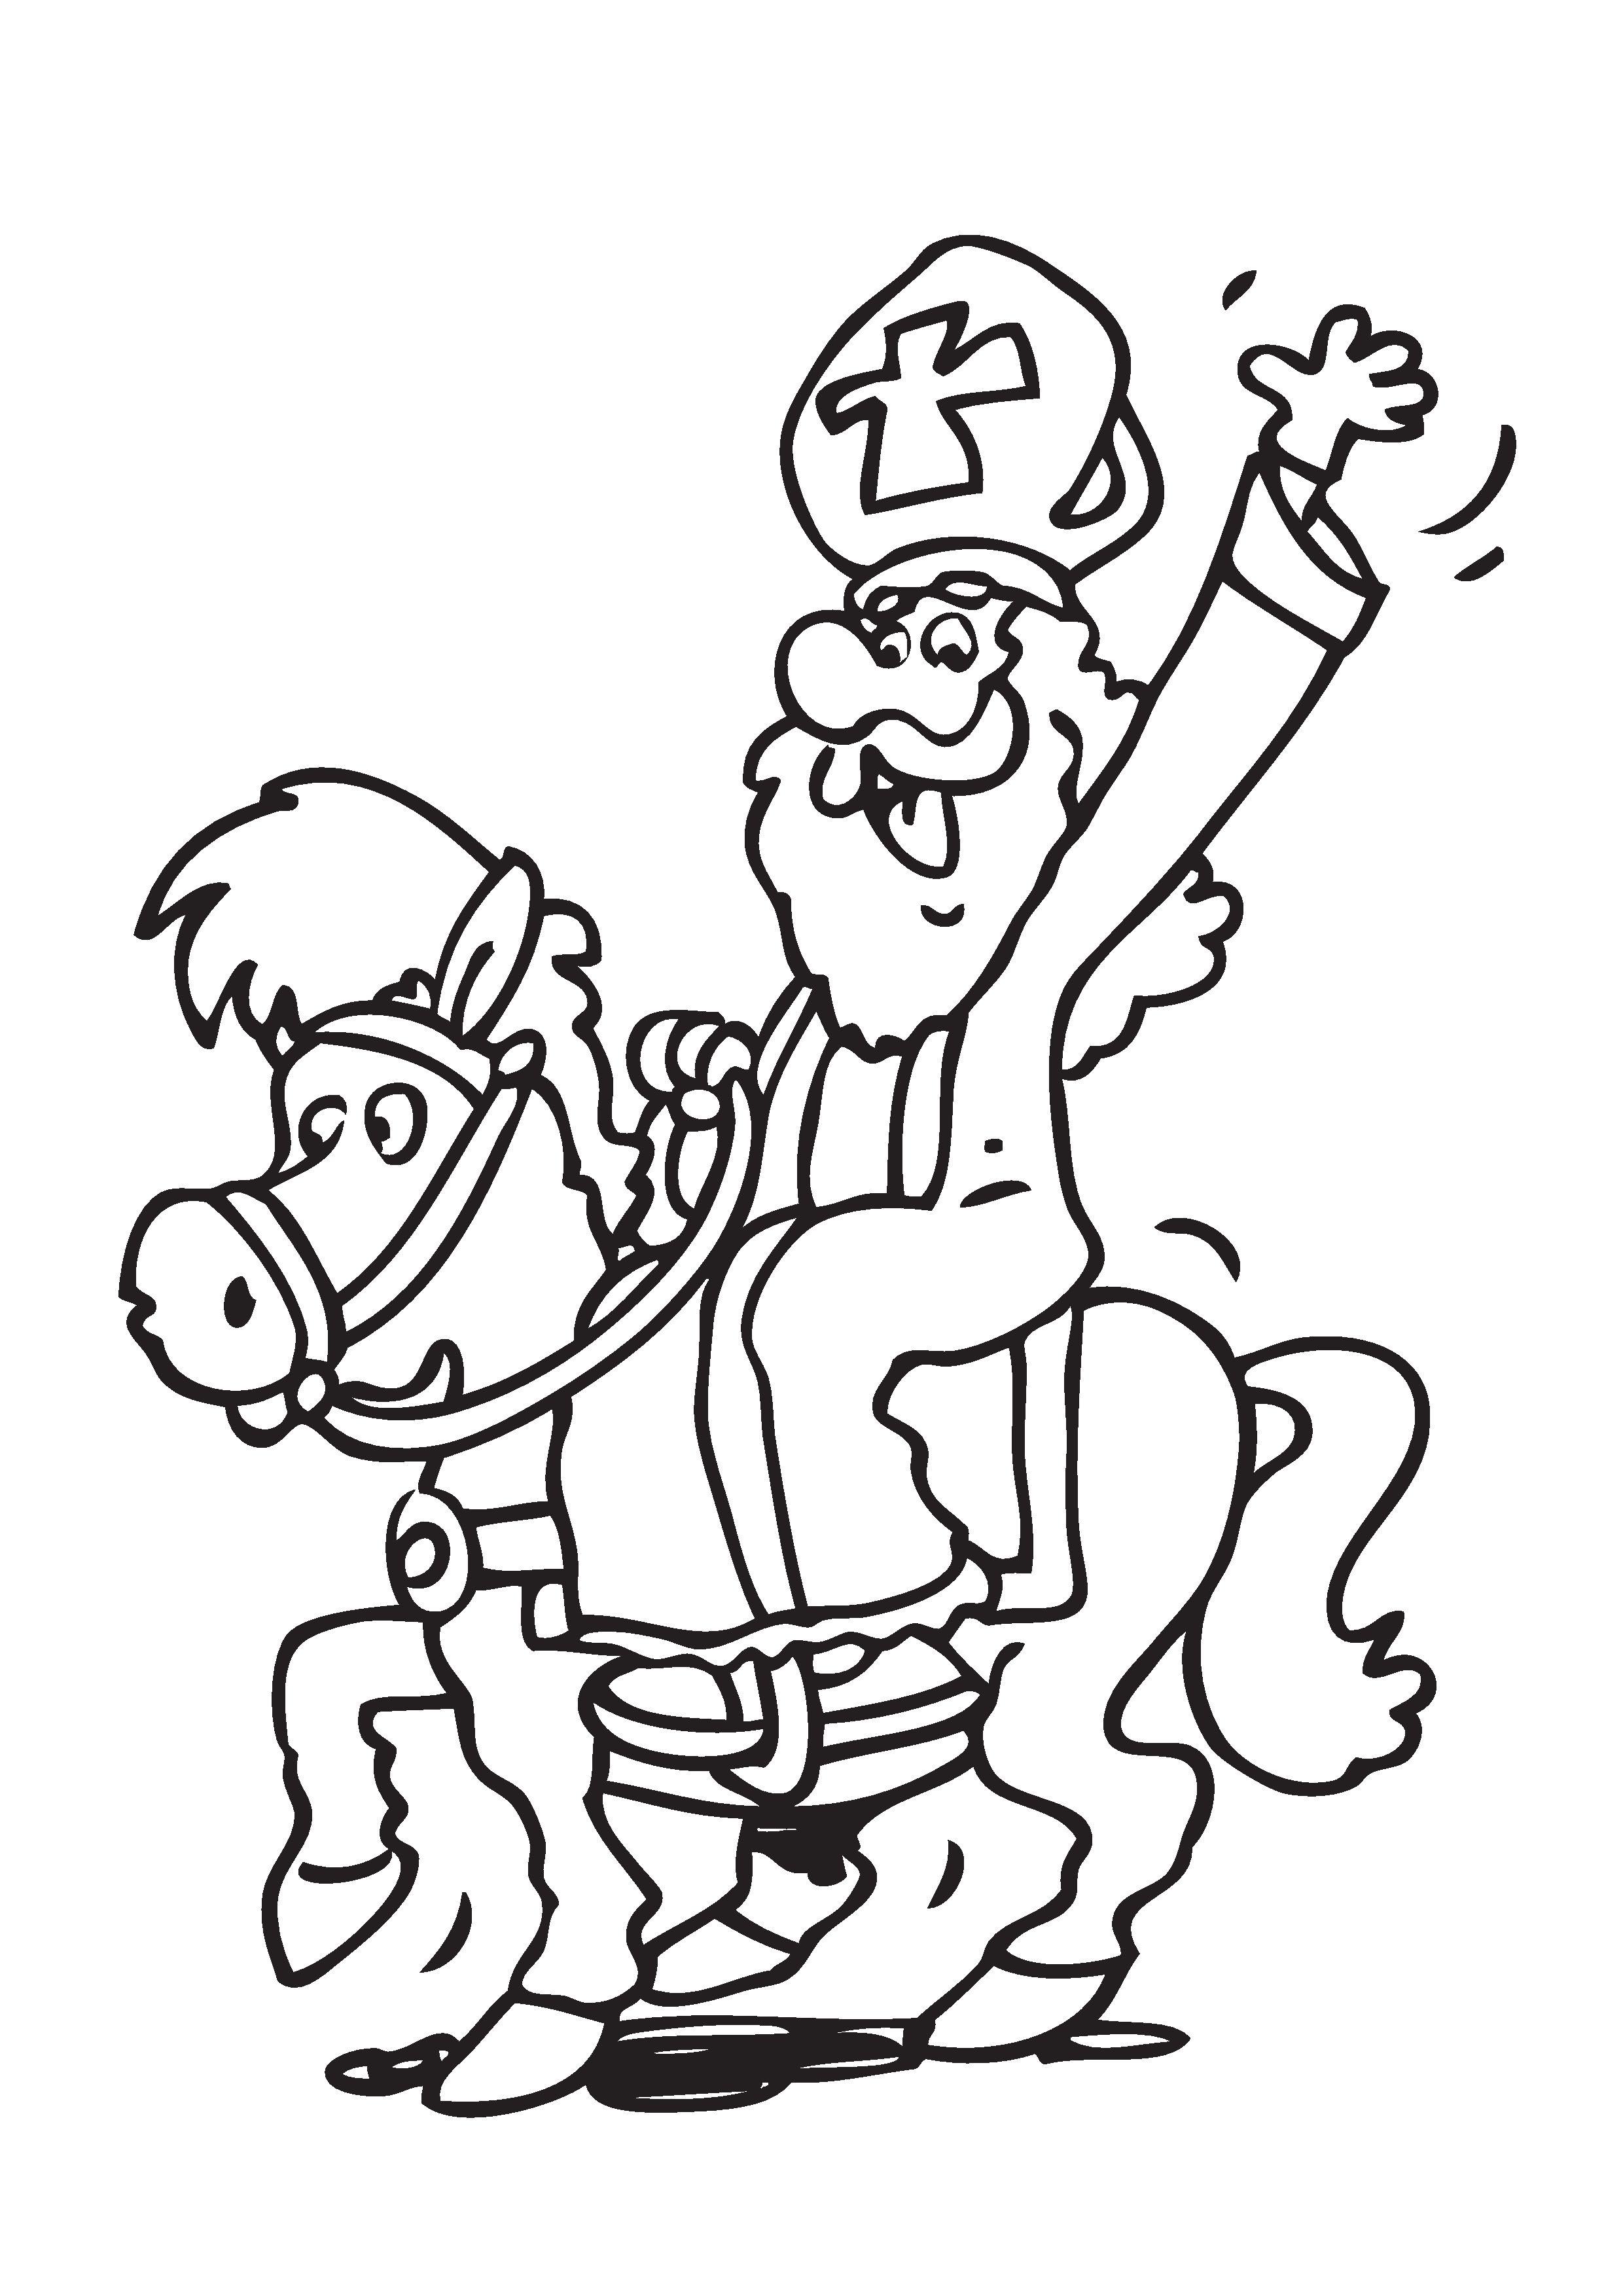 Quatang Gallery- Kleurplaat Sinterklaas Paard 2020 Voor Peuters En Kleuters